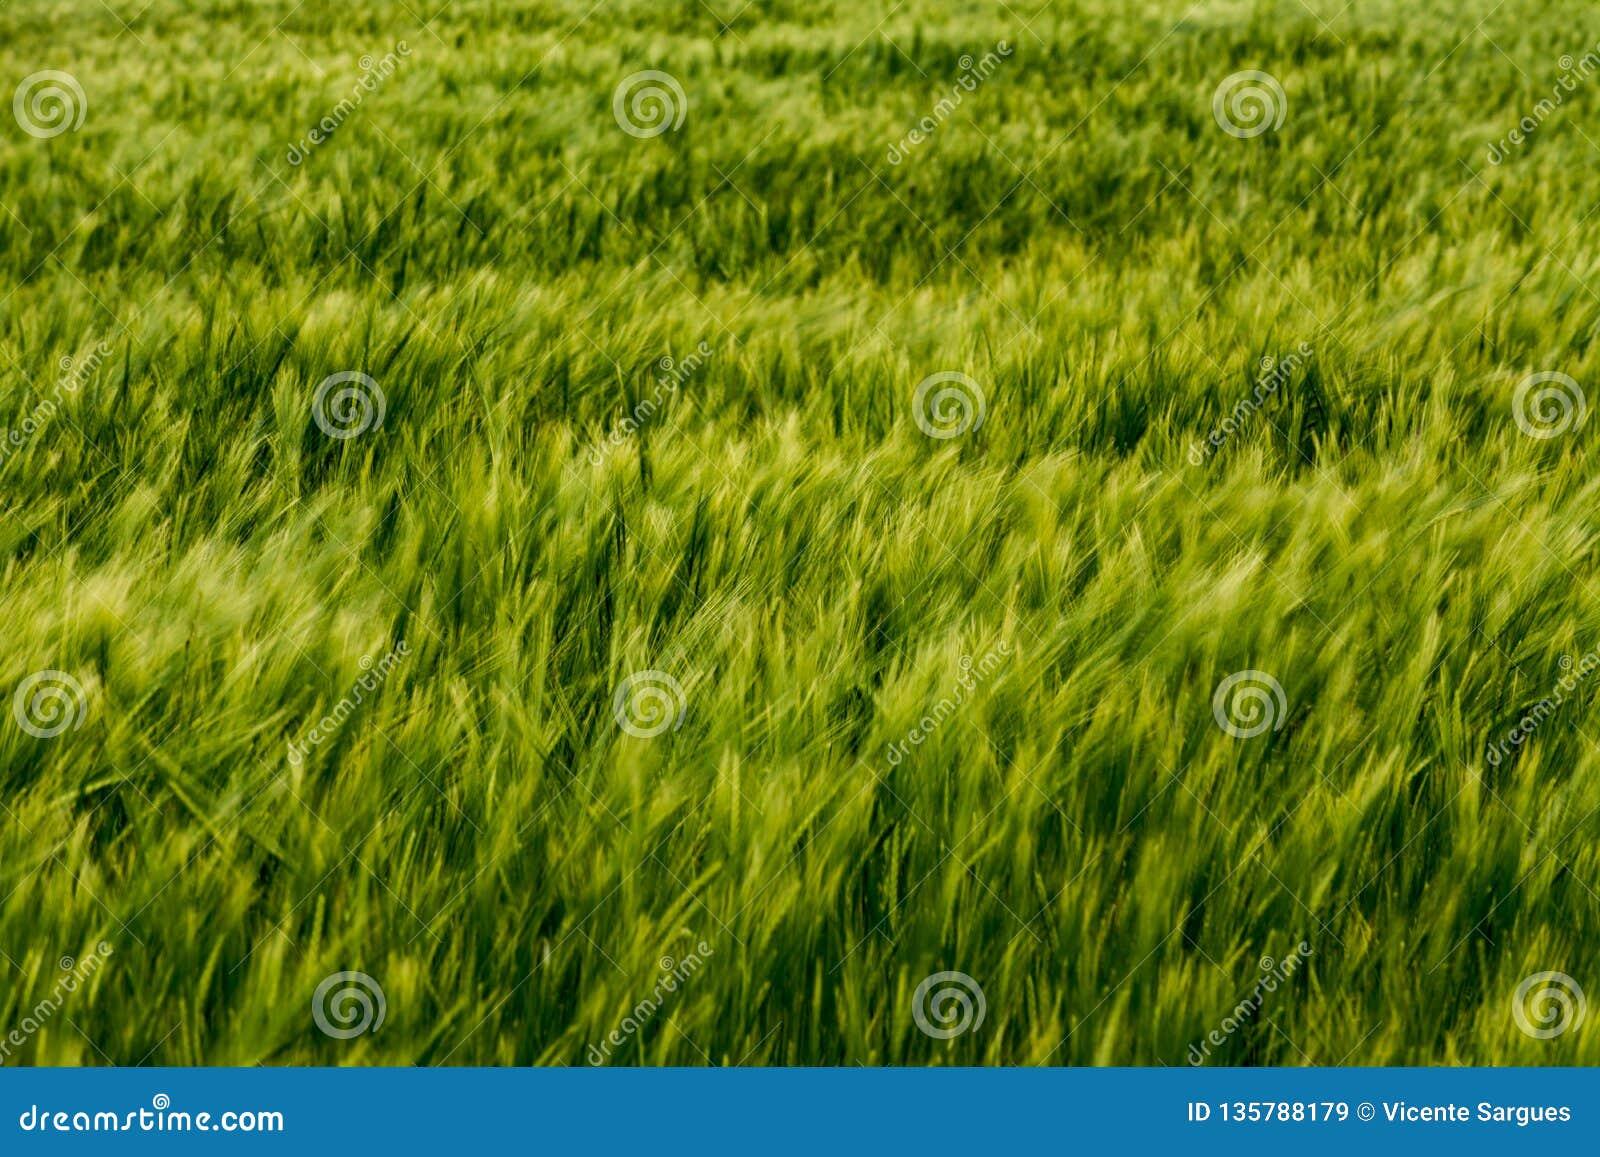 Det abstrakta sädes- gröna fältet blured grova spikar